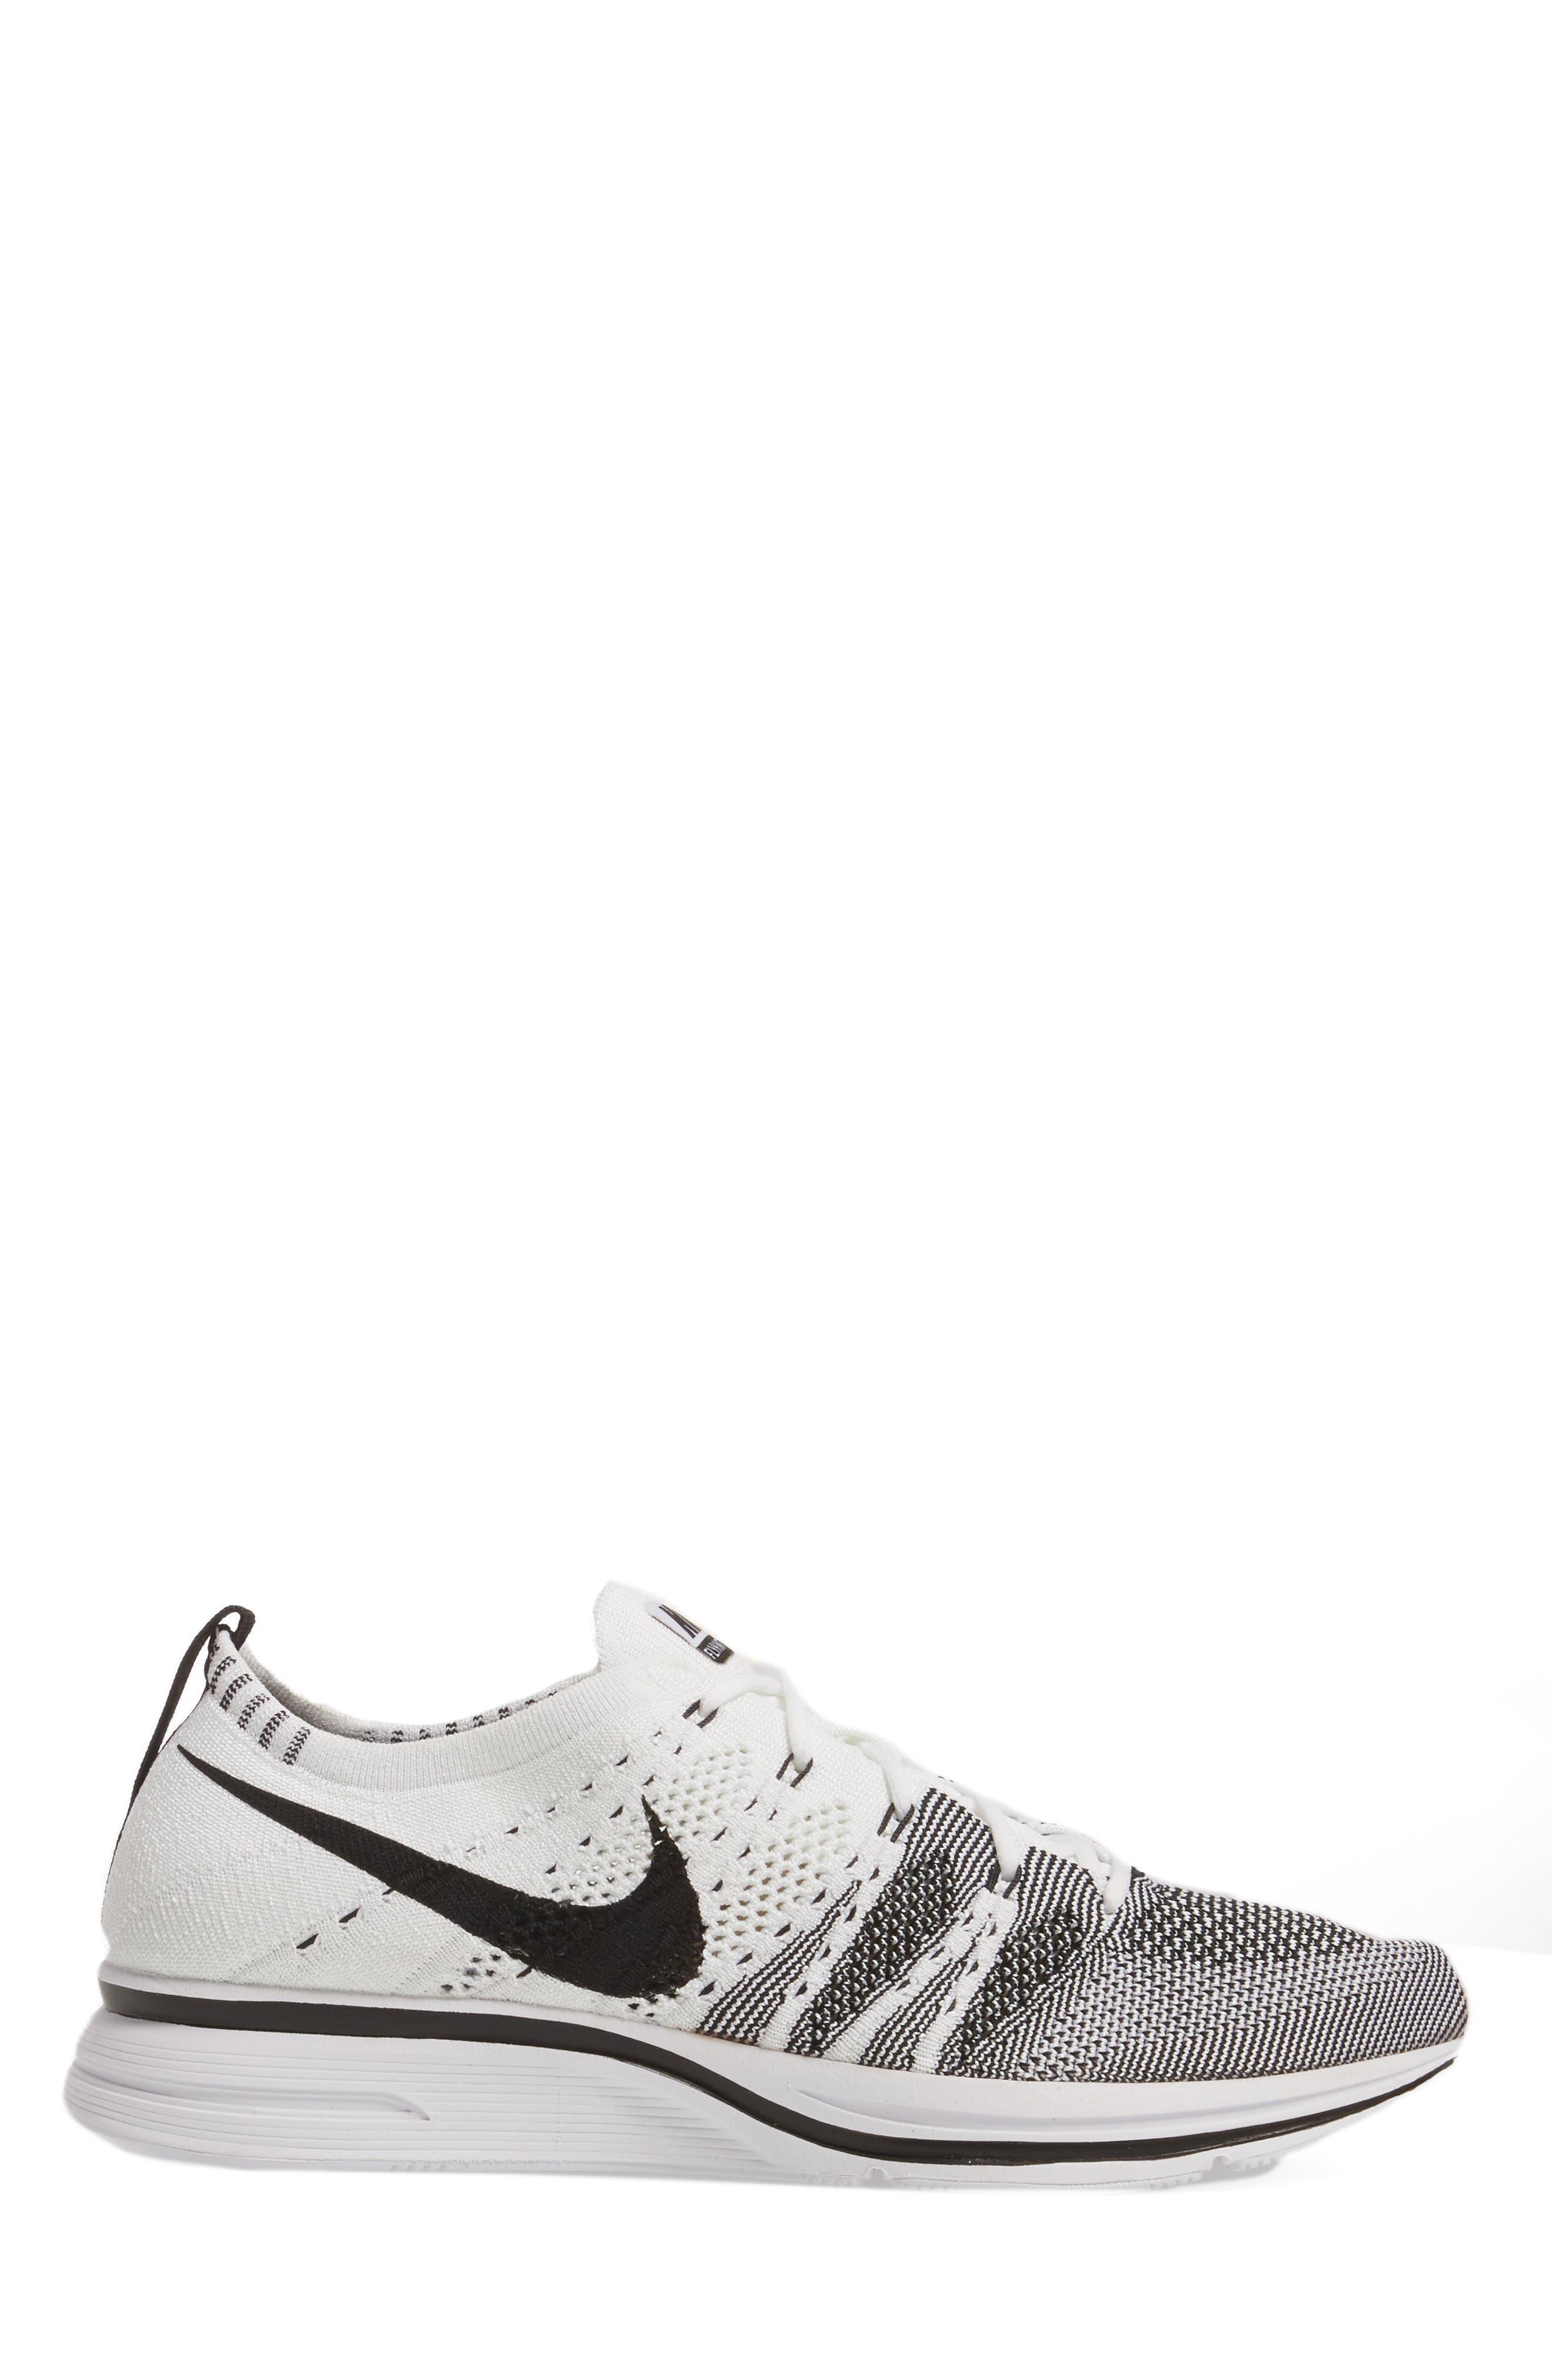 NikeLab Flyknit Trainer Sneaker,                             Alternate thumbnail 3, color,                             100